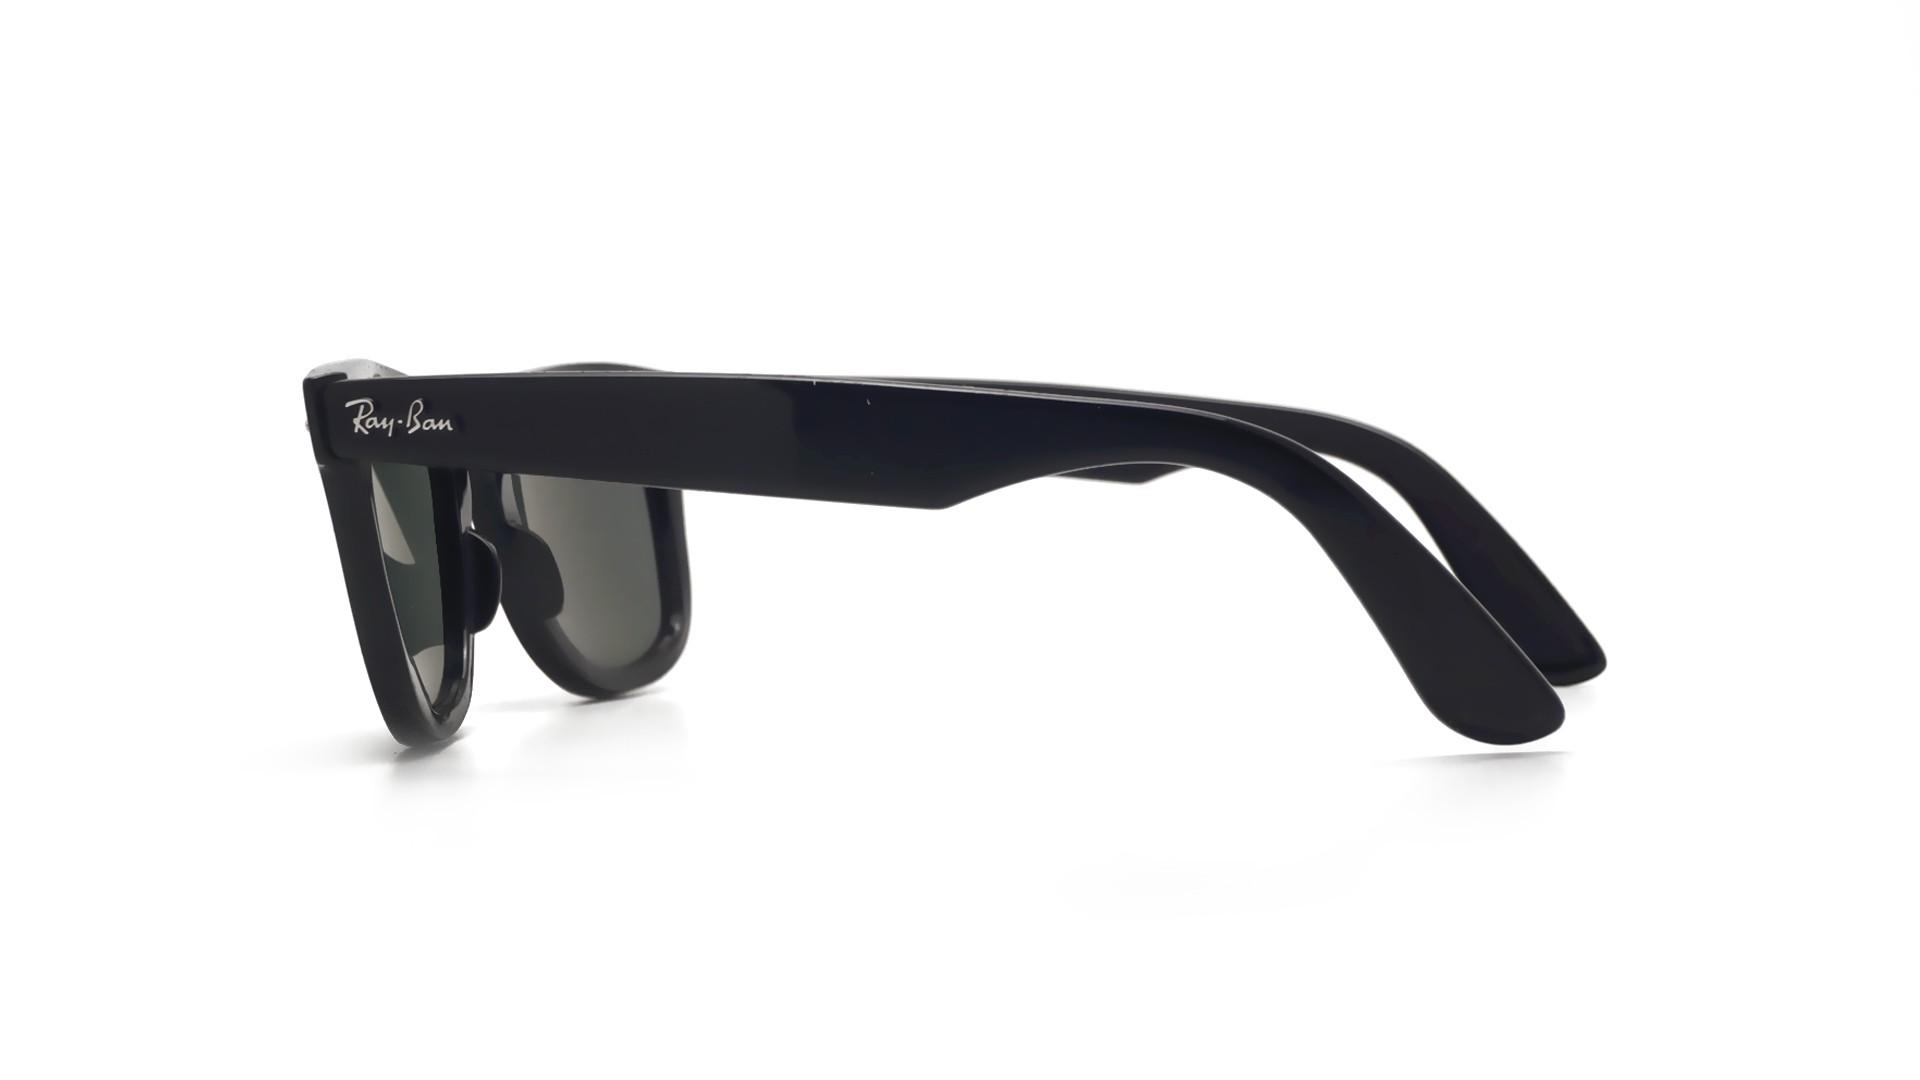 ac09748fd1 Sunglasses Ray-Ban Wayfarer Ease Black RB4340 601 58 50-22 Medium Polarized